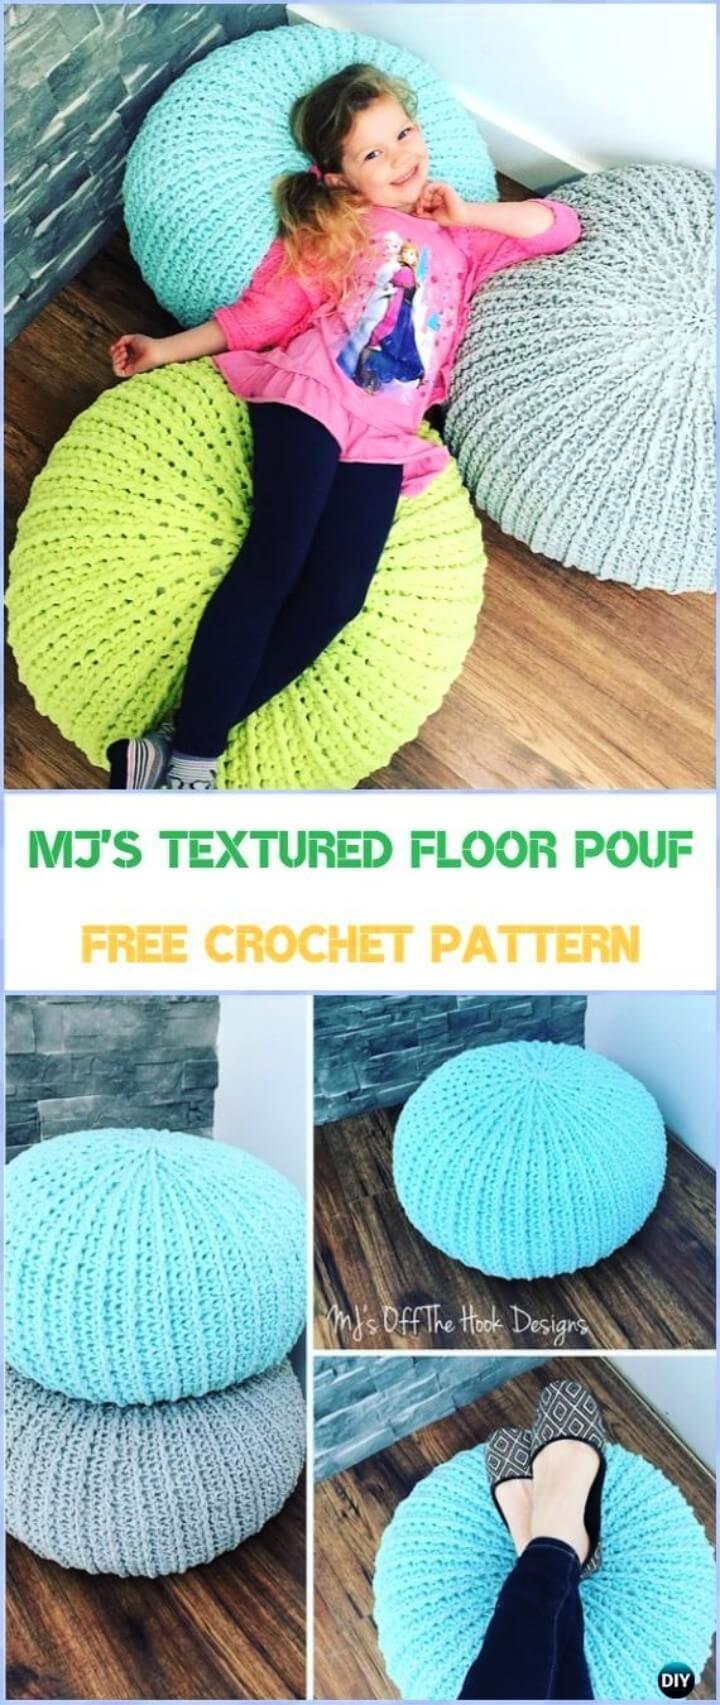 MJ's Textured Floor Pouf